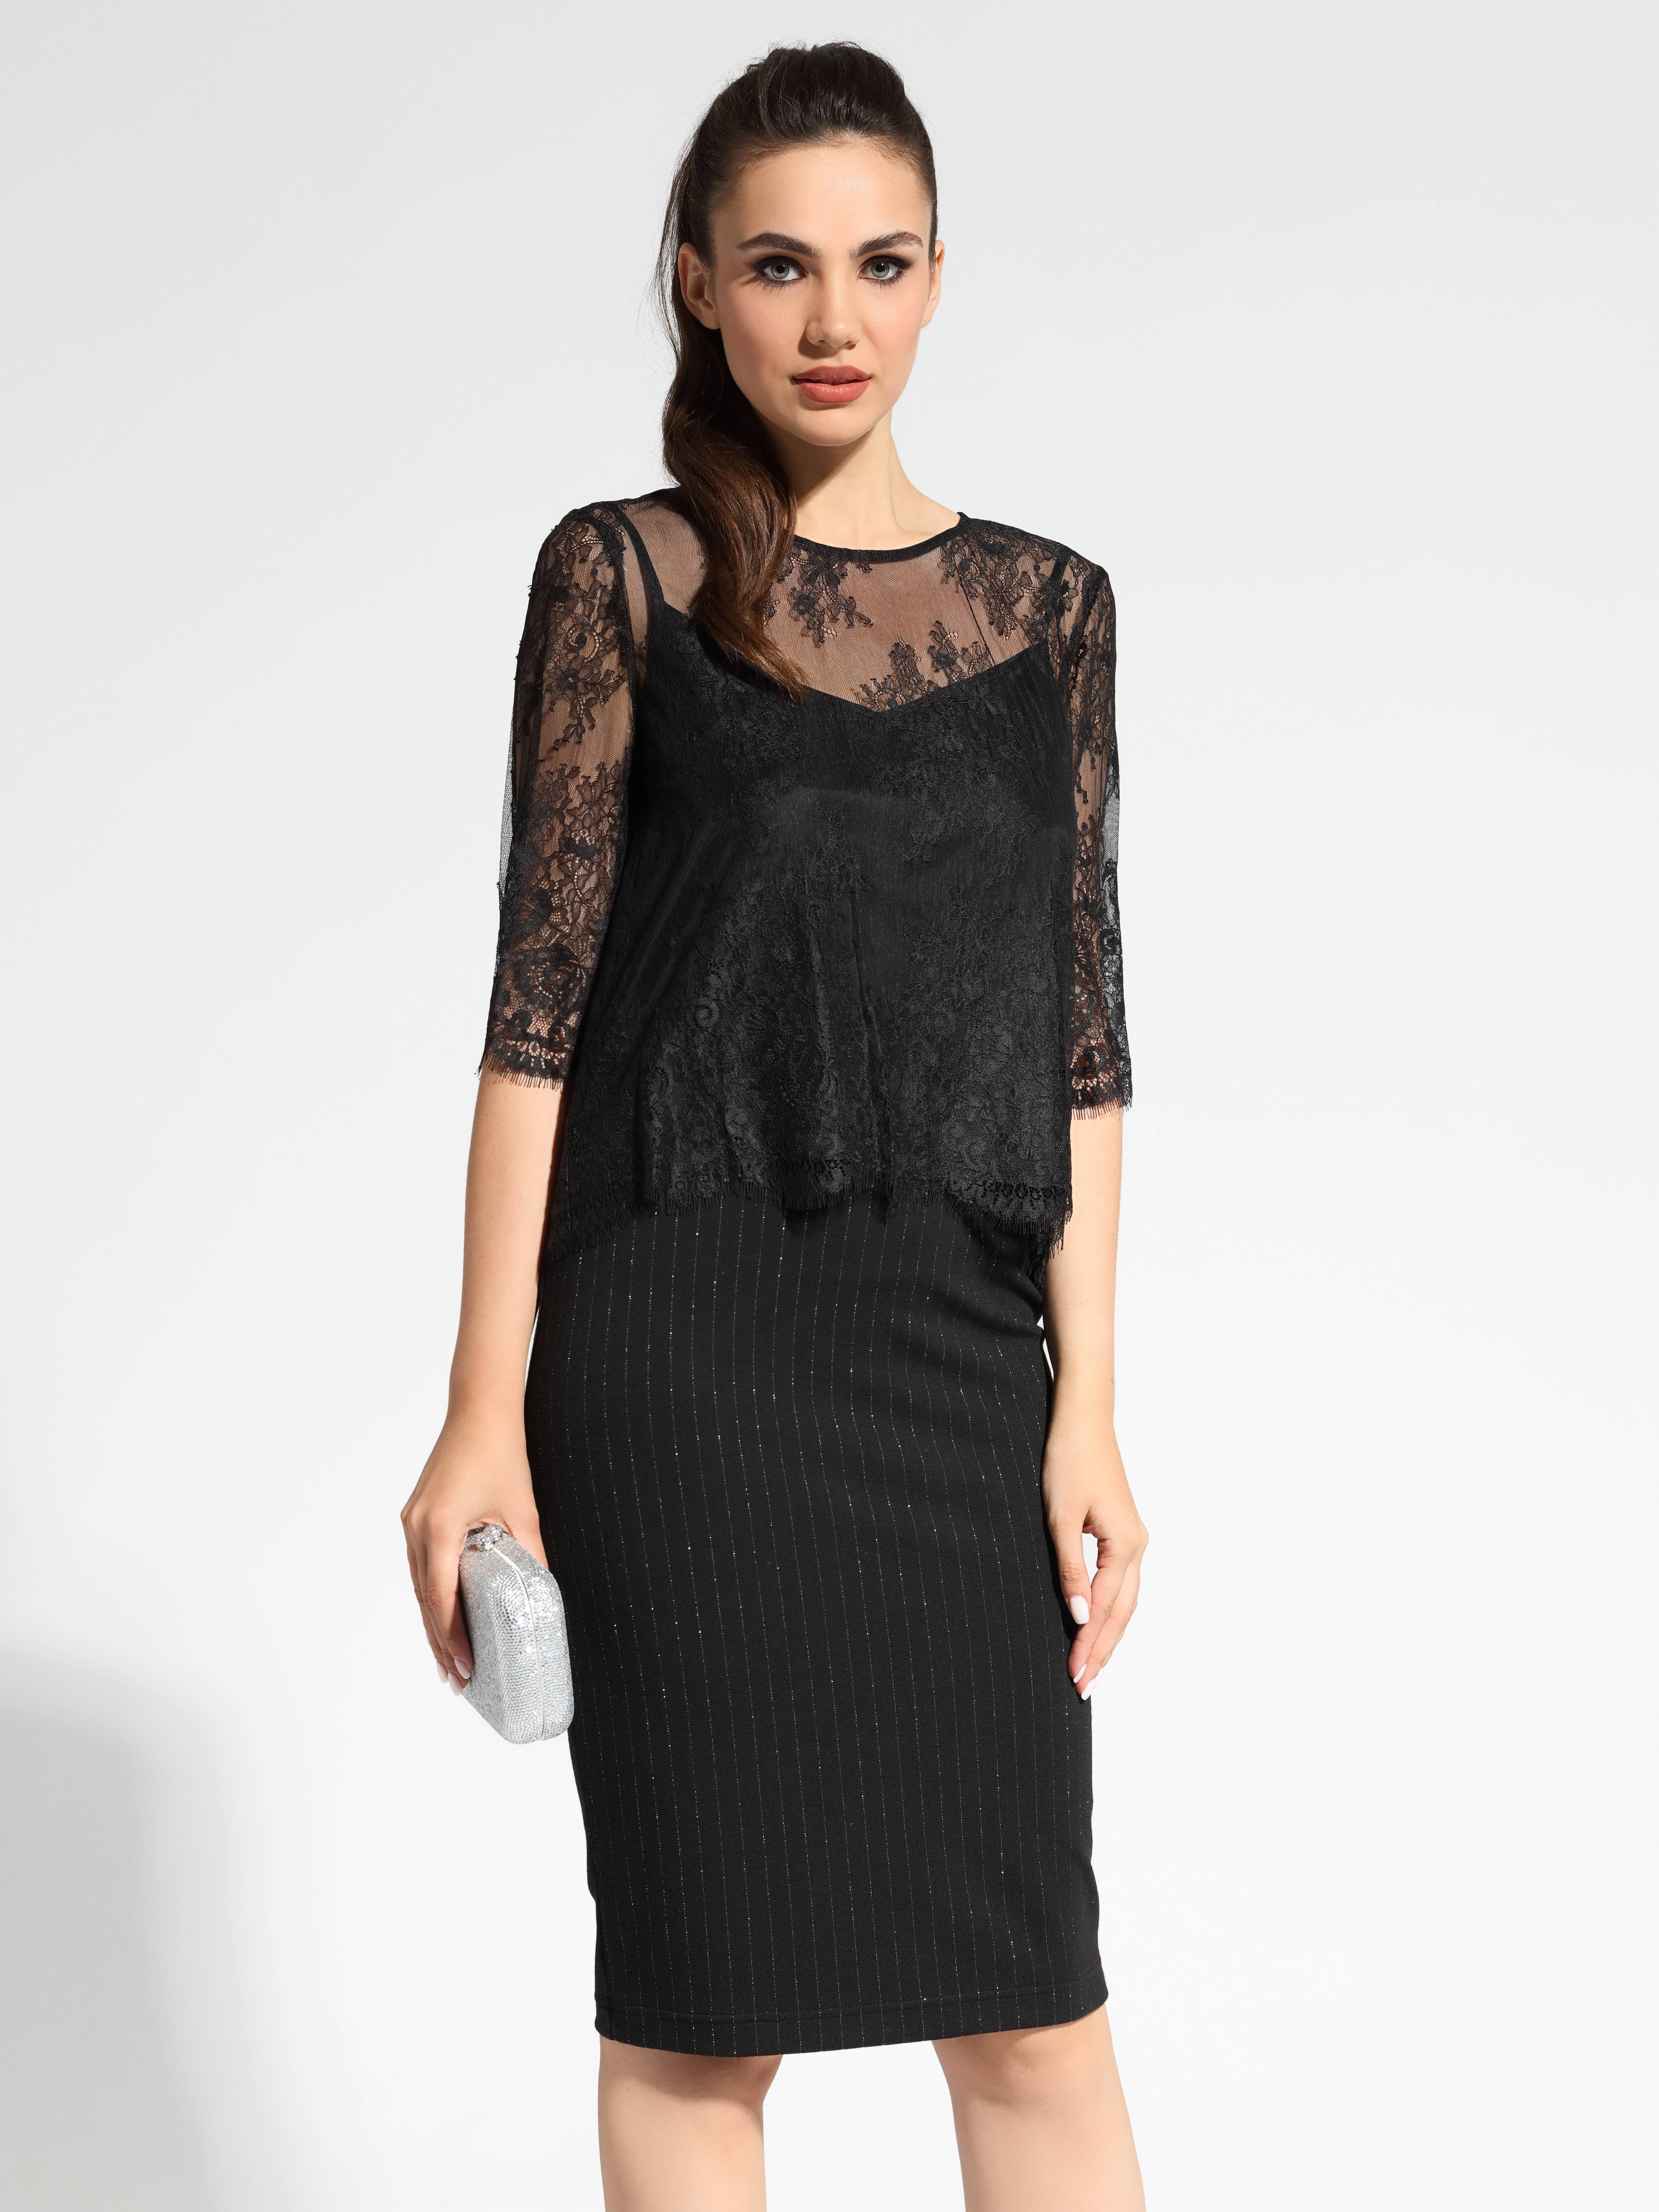 Фото 2 - Блузку женская ⭐️ Черная вечерняя блузка LBL 1060 ⭐️ цвет royal black